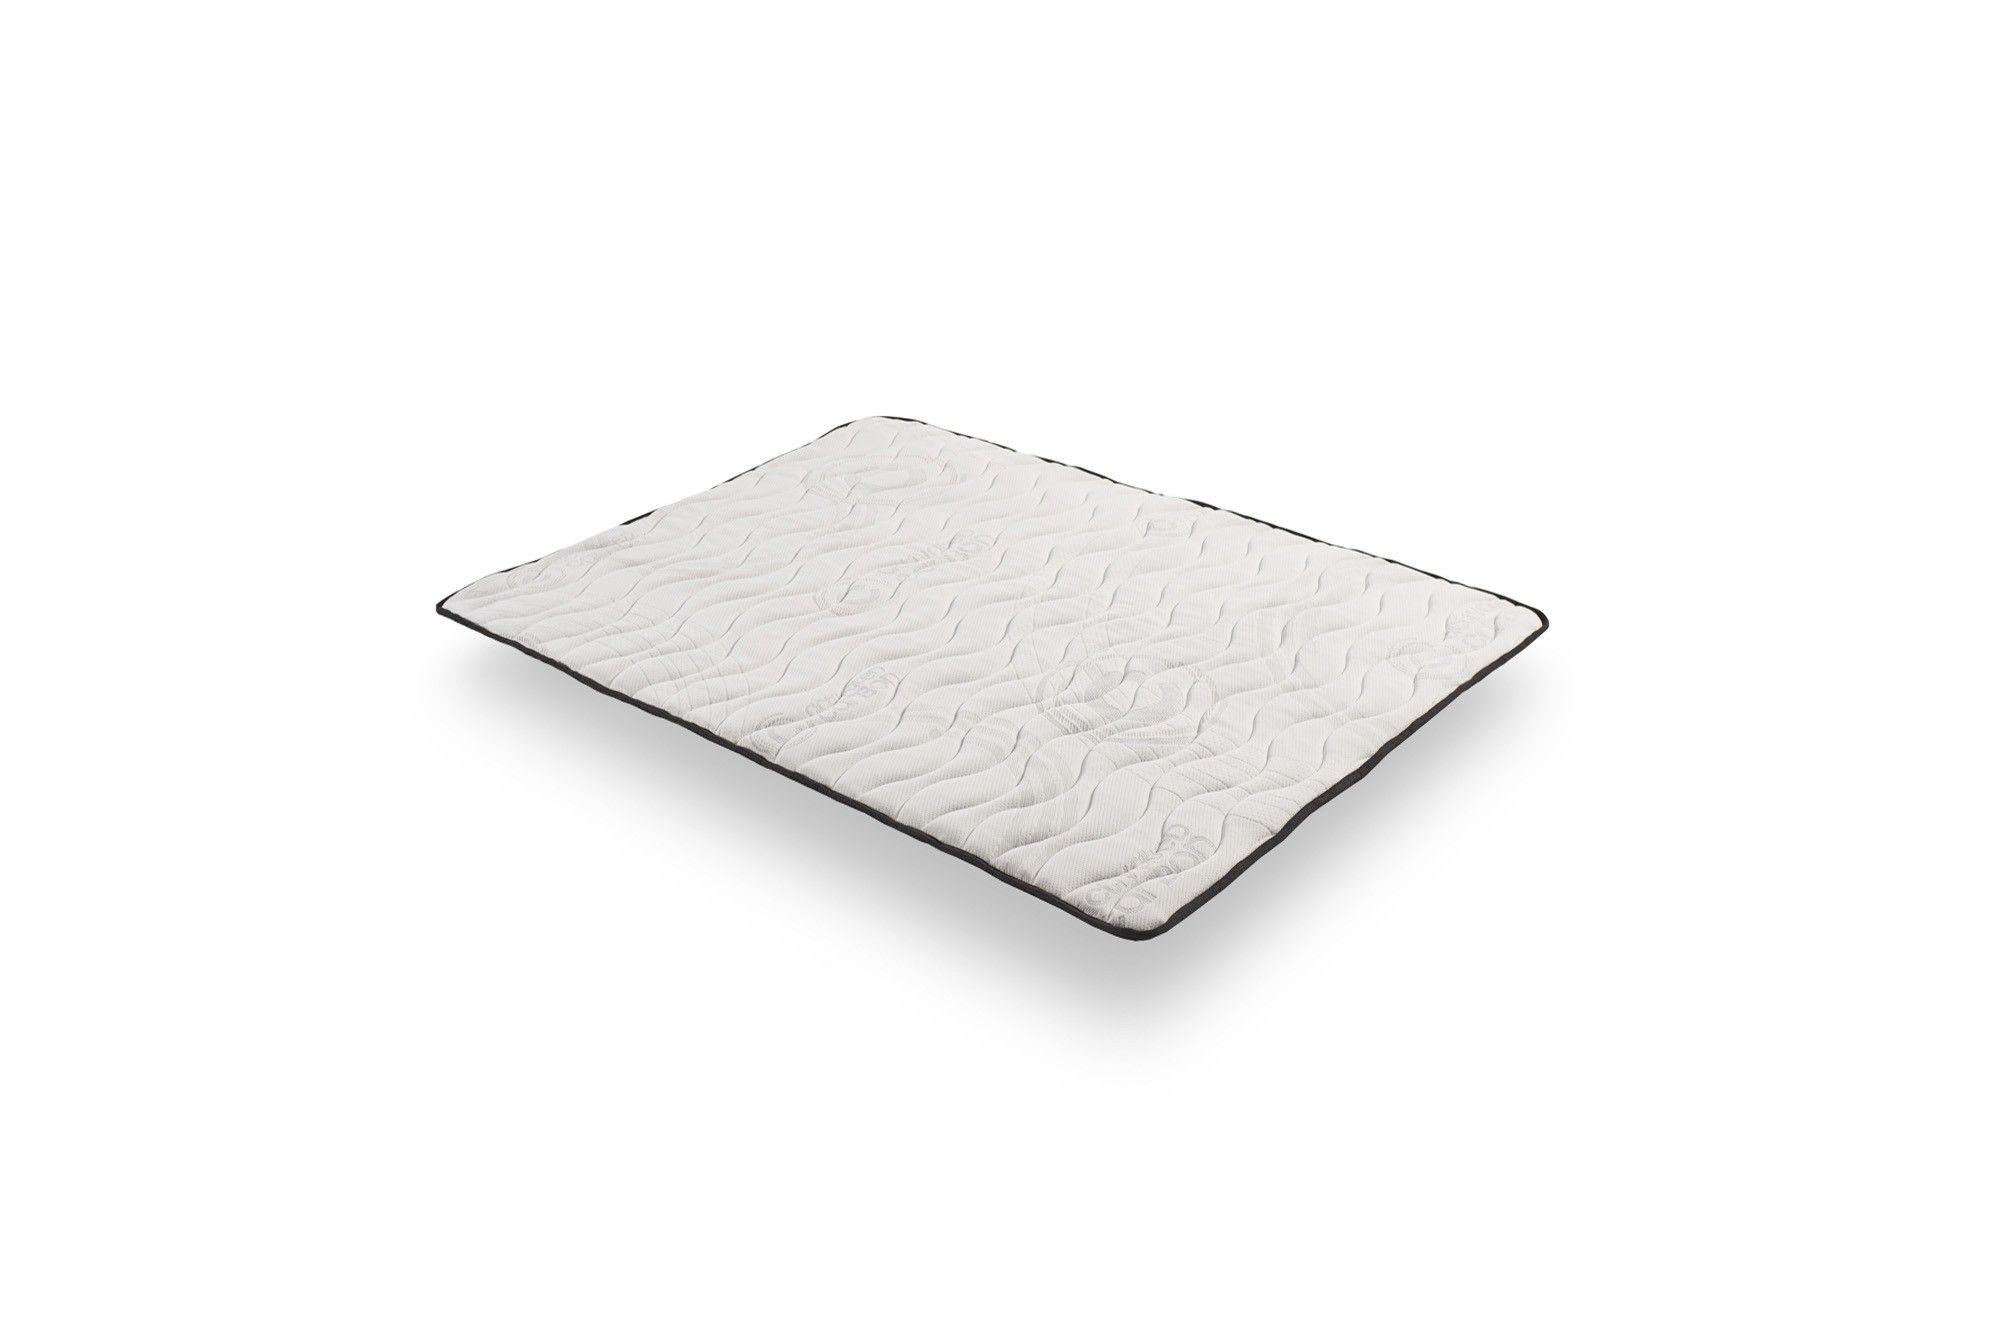 Memory Foam Topper «Carbon»| Natuurlijk Latex | Antistress technologie | Cosmos beddengoed